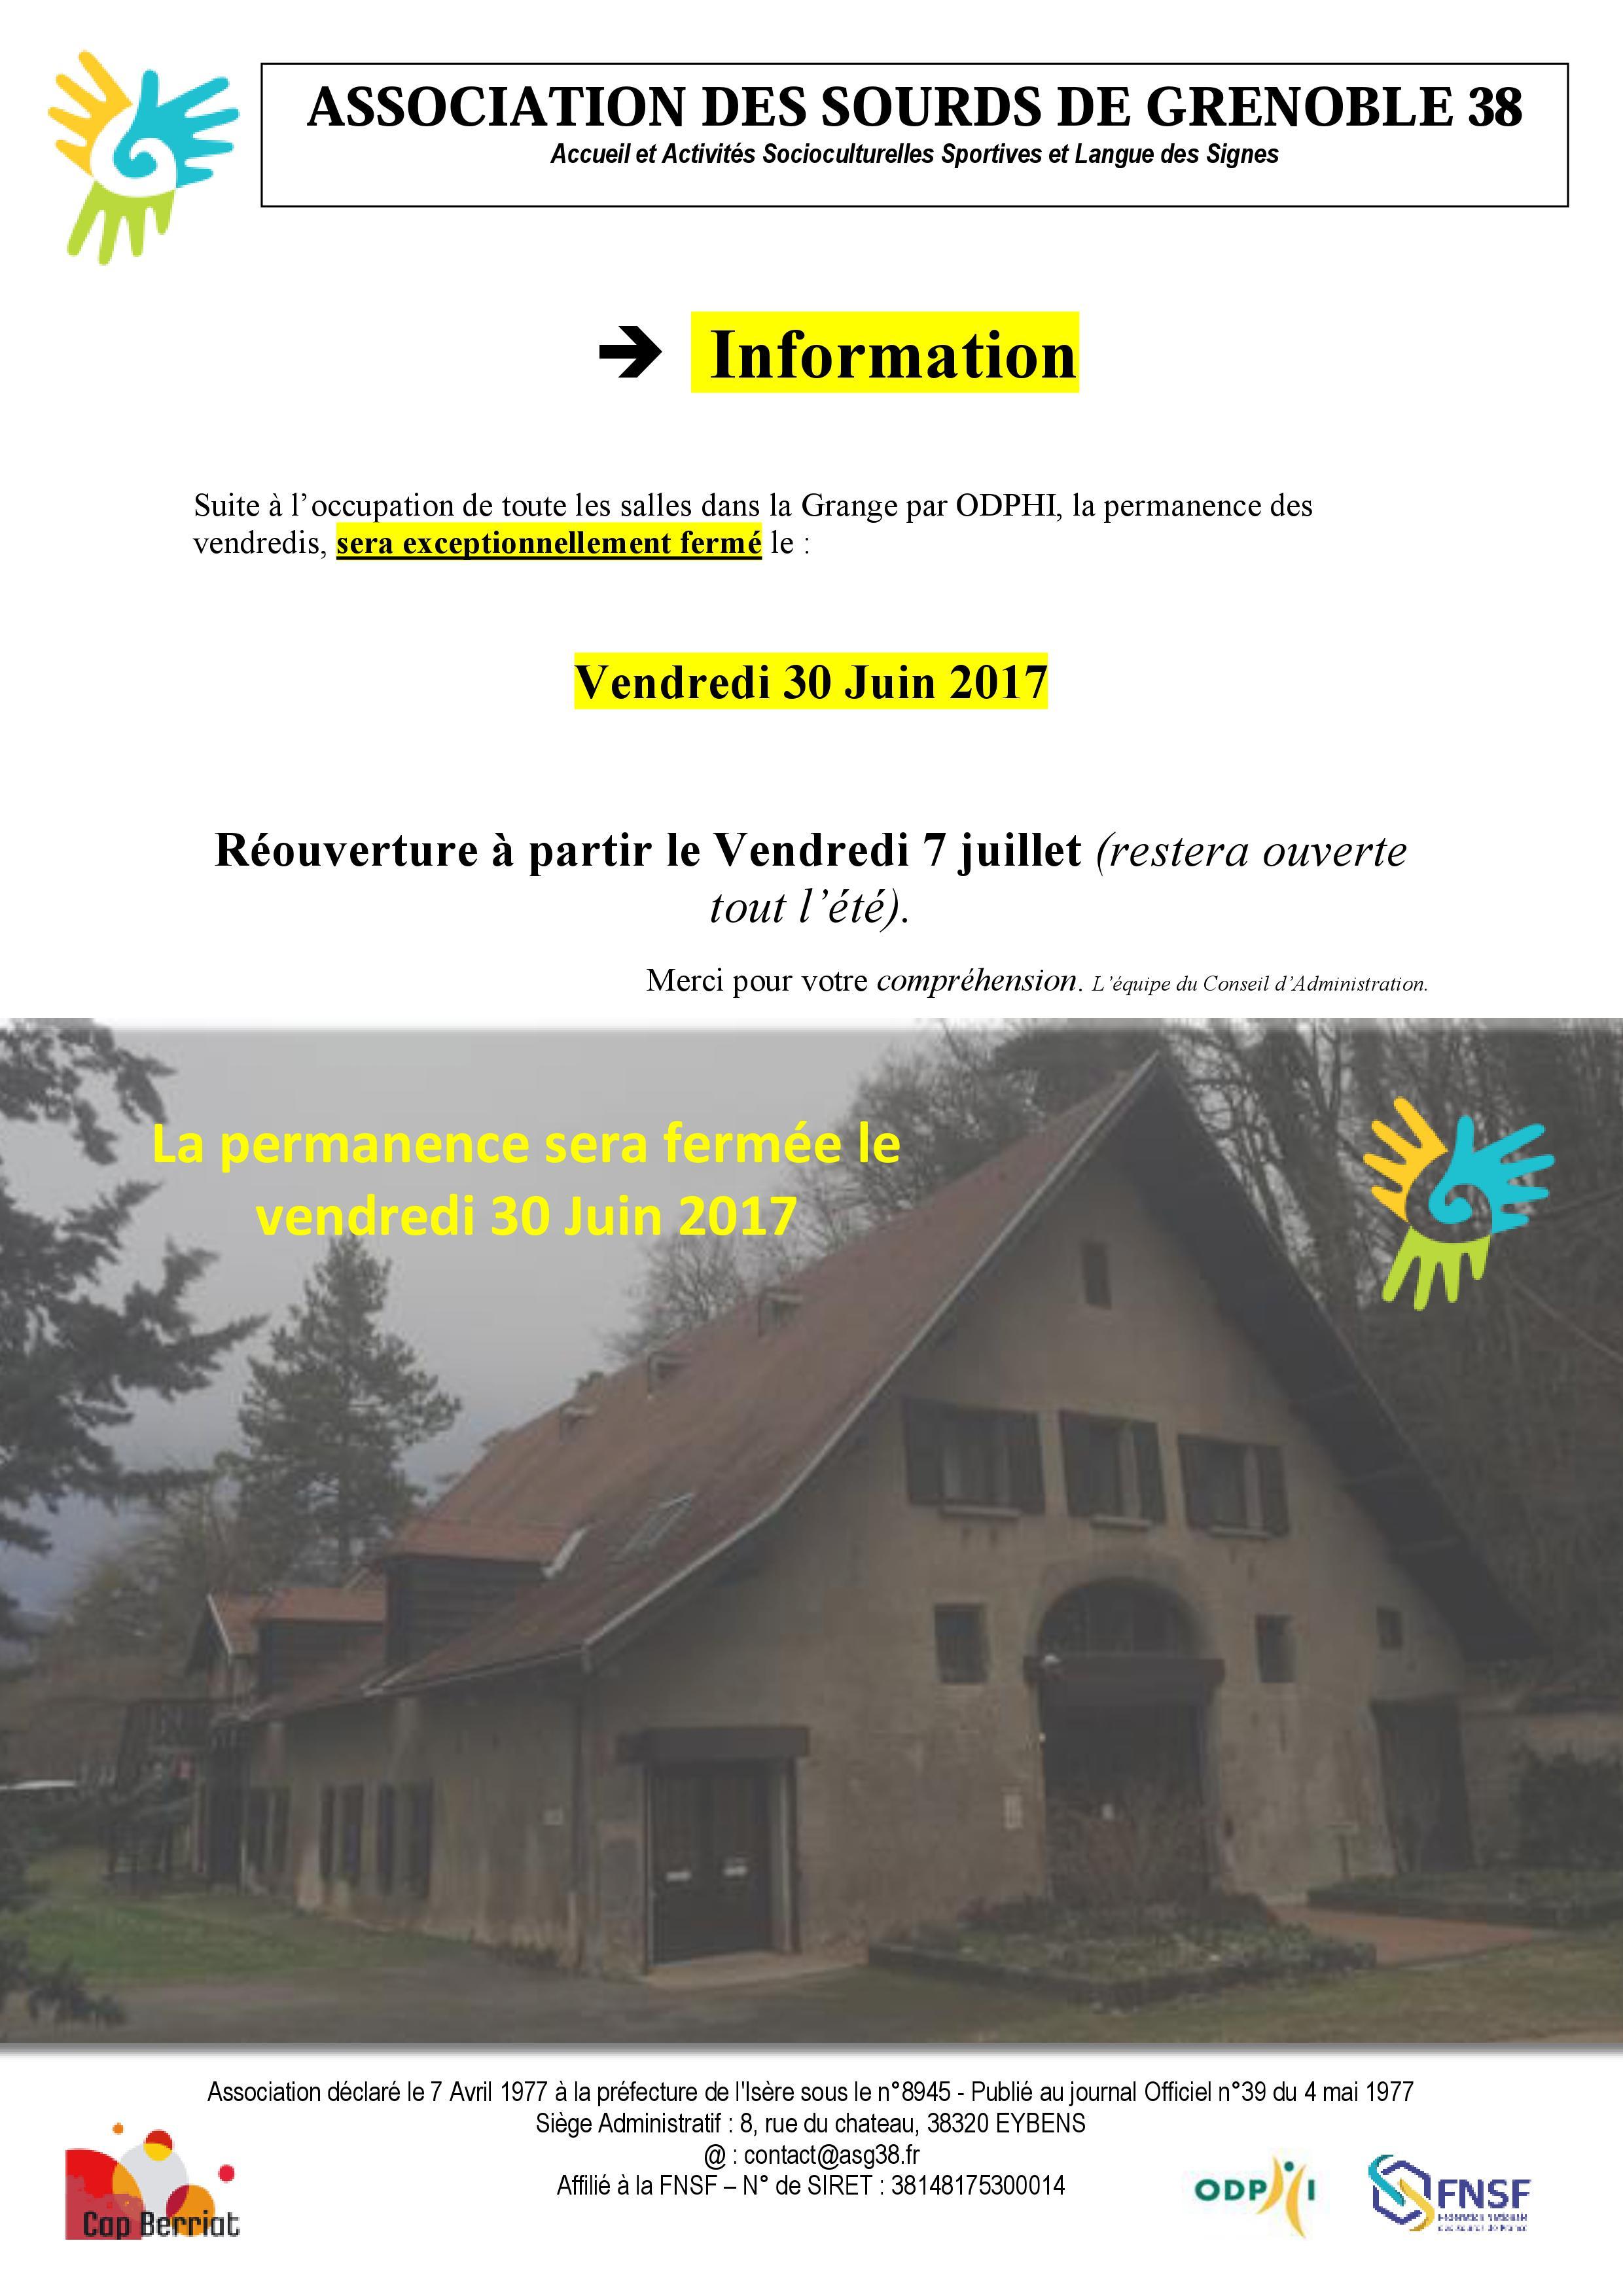 info grange permanance ODPHI du 30 JUIN